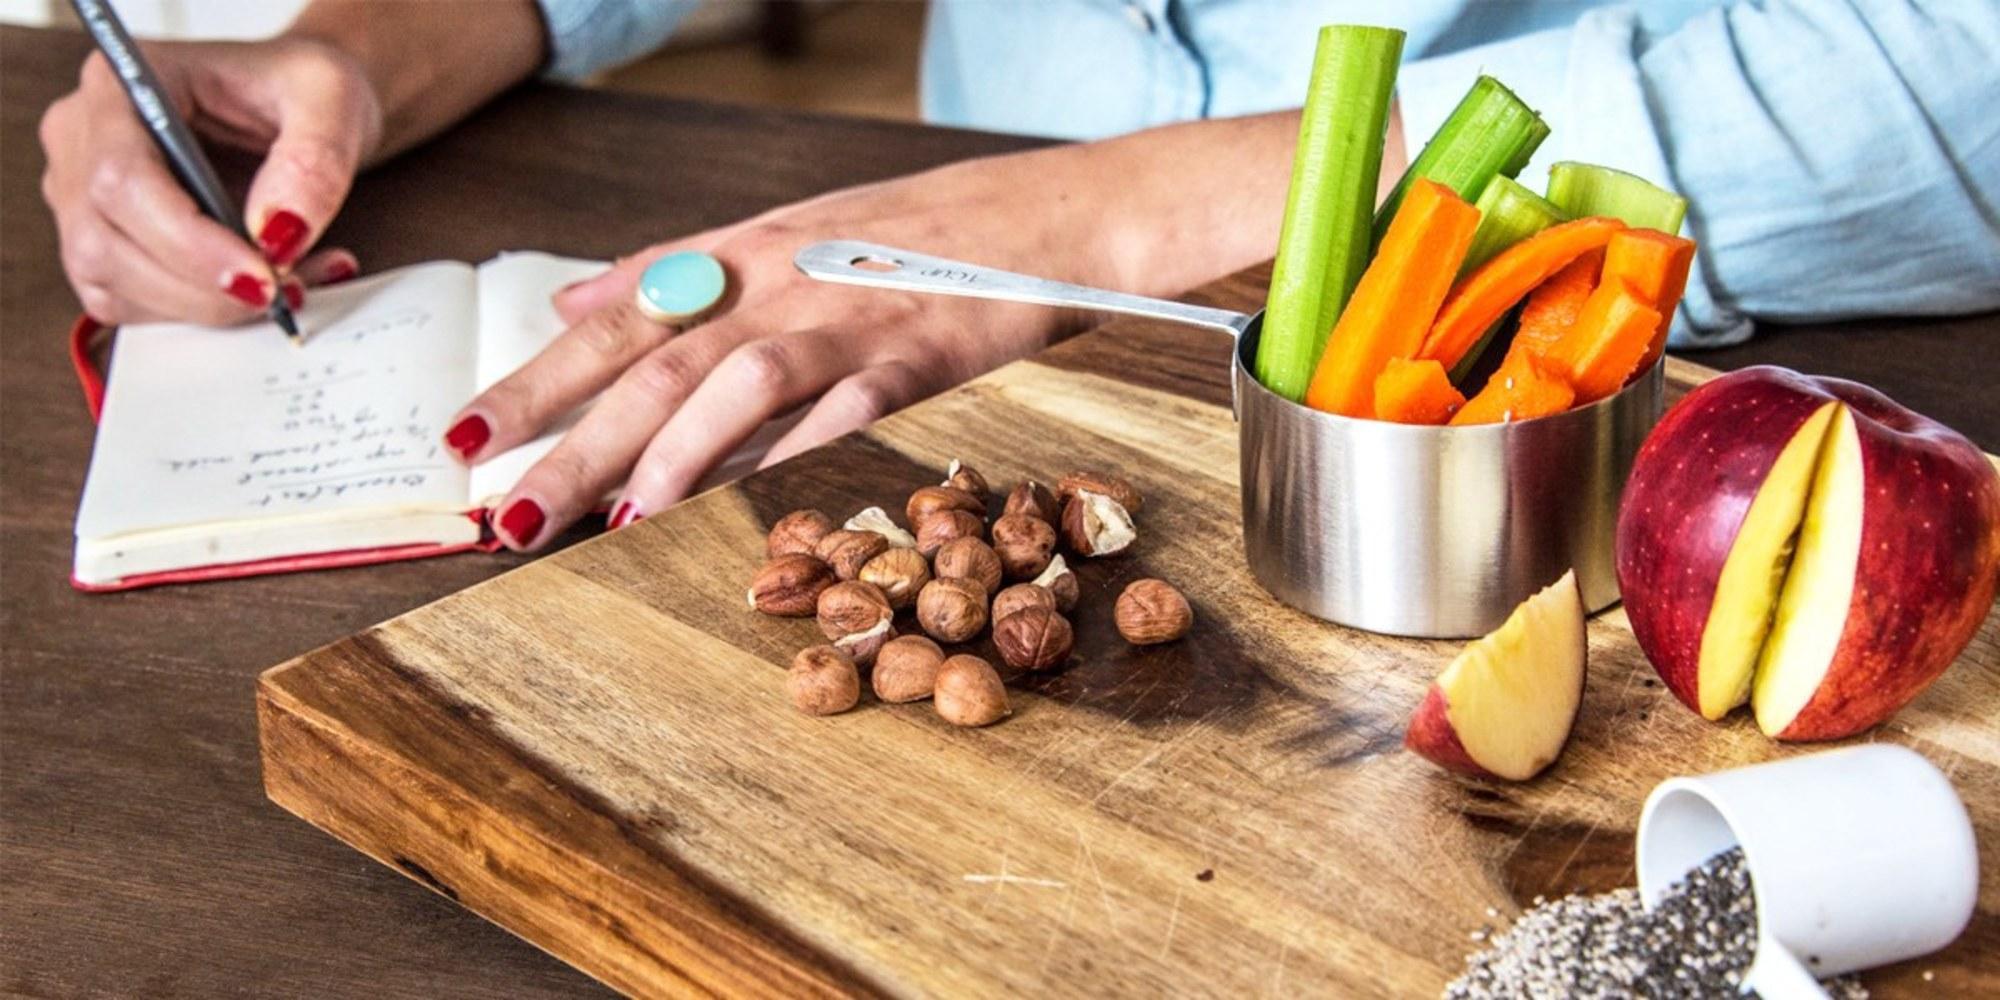 Диета борменталя рецепты блюд